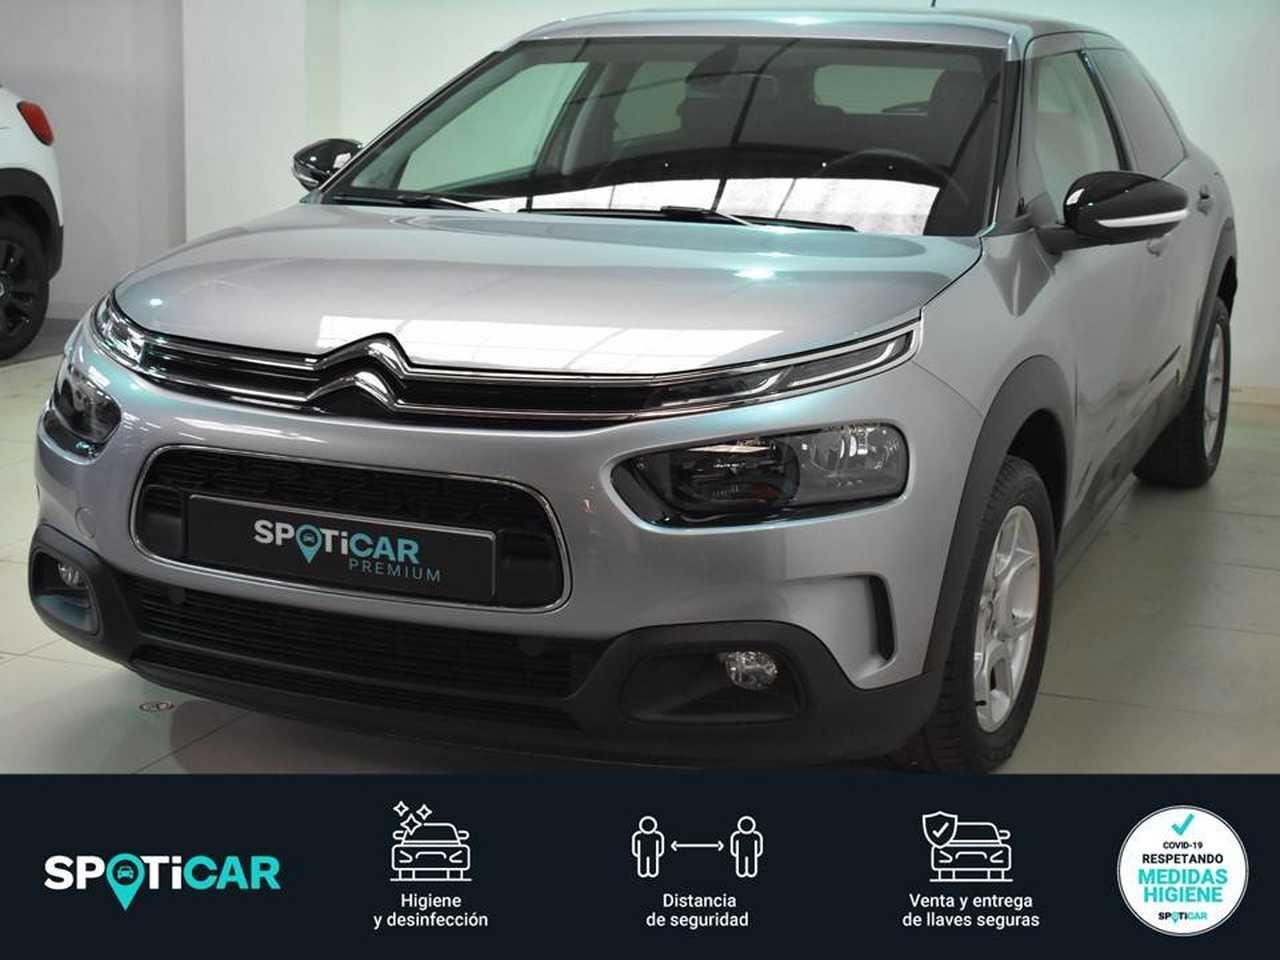 Citroën C4 Cactus Diésel en Paterna